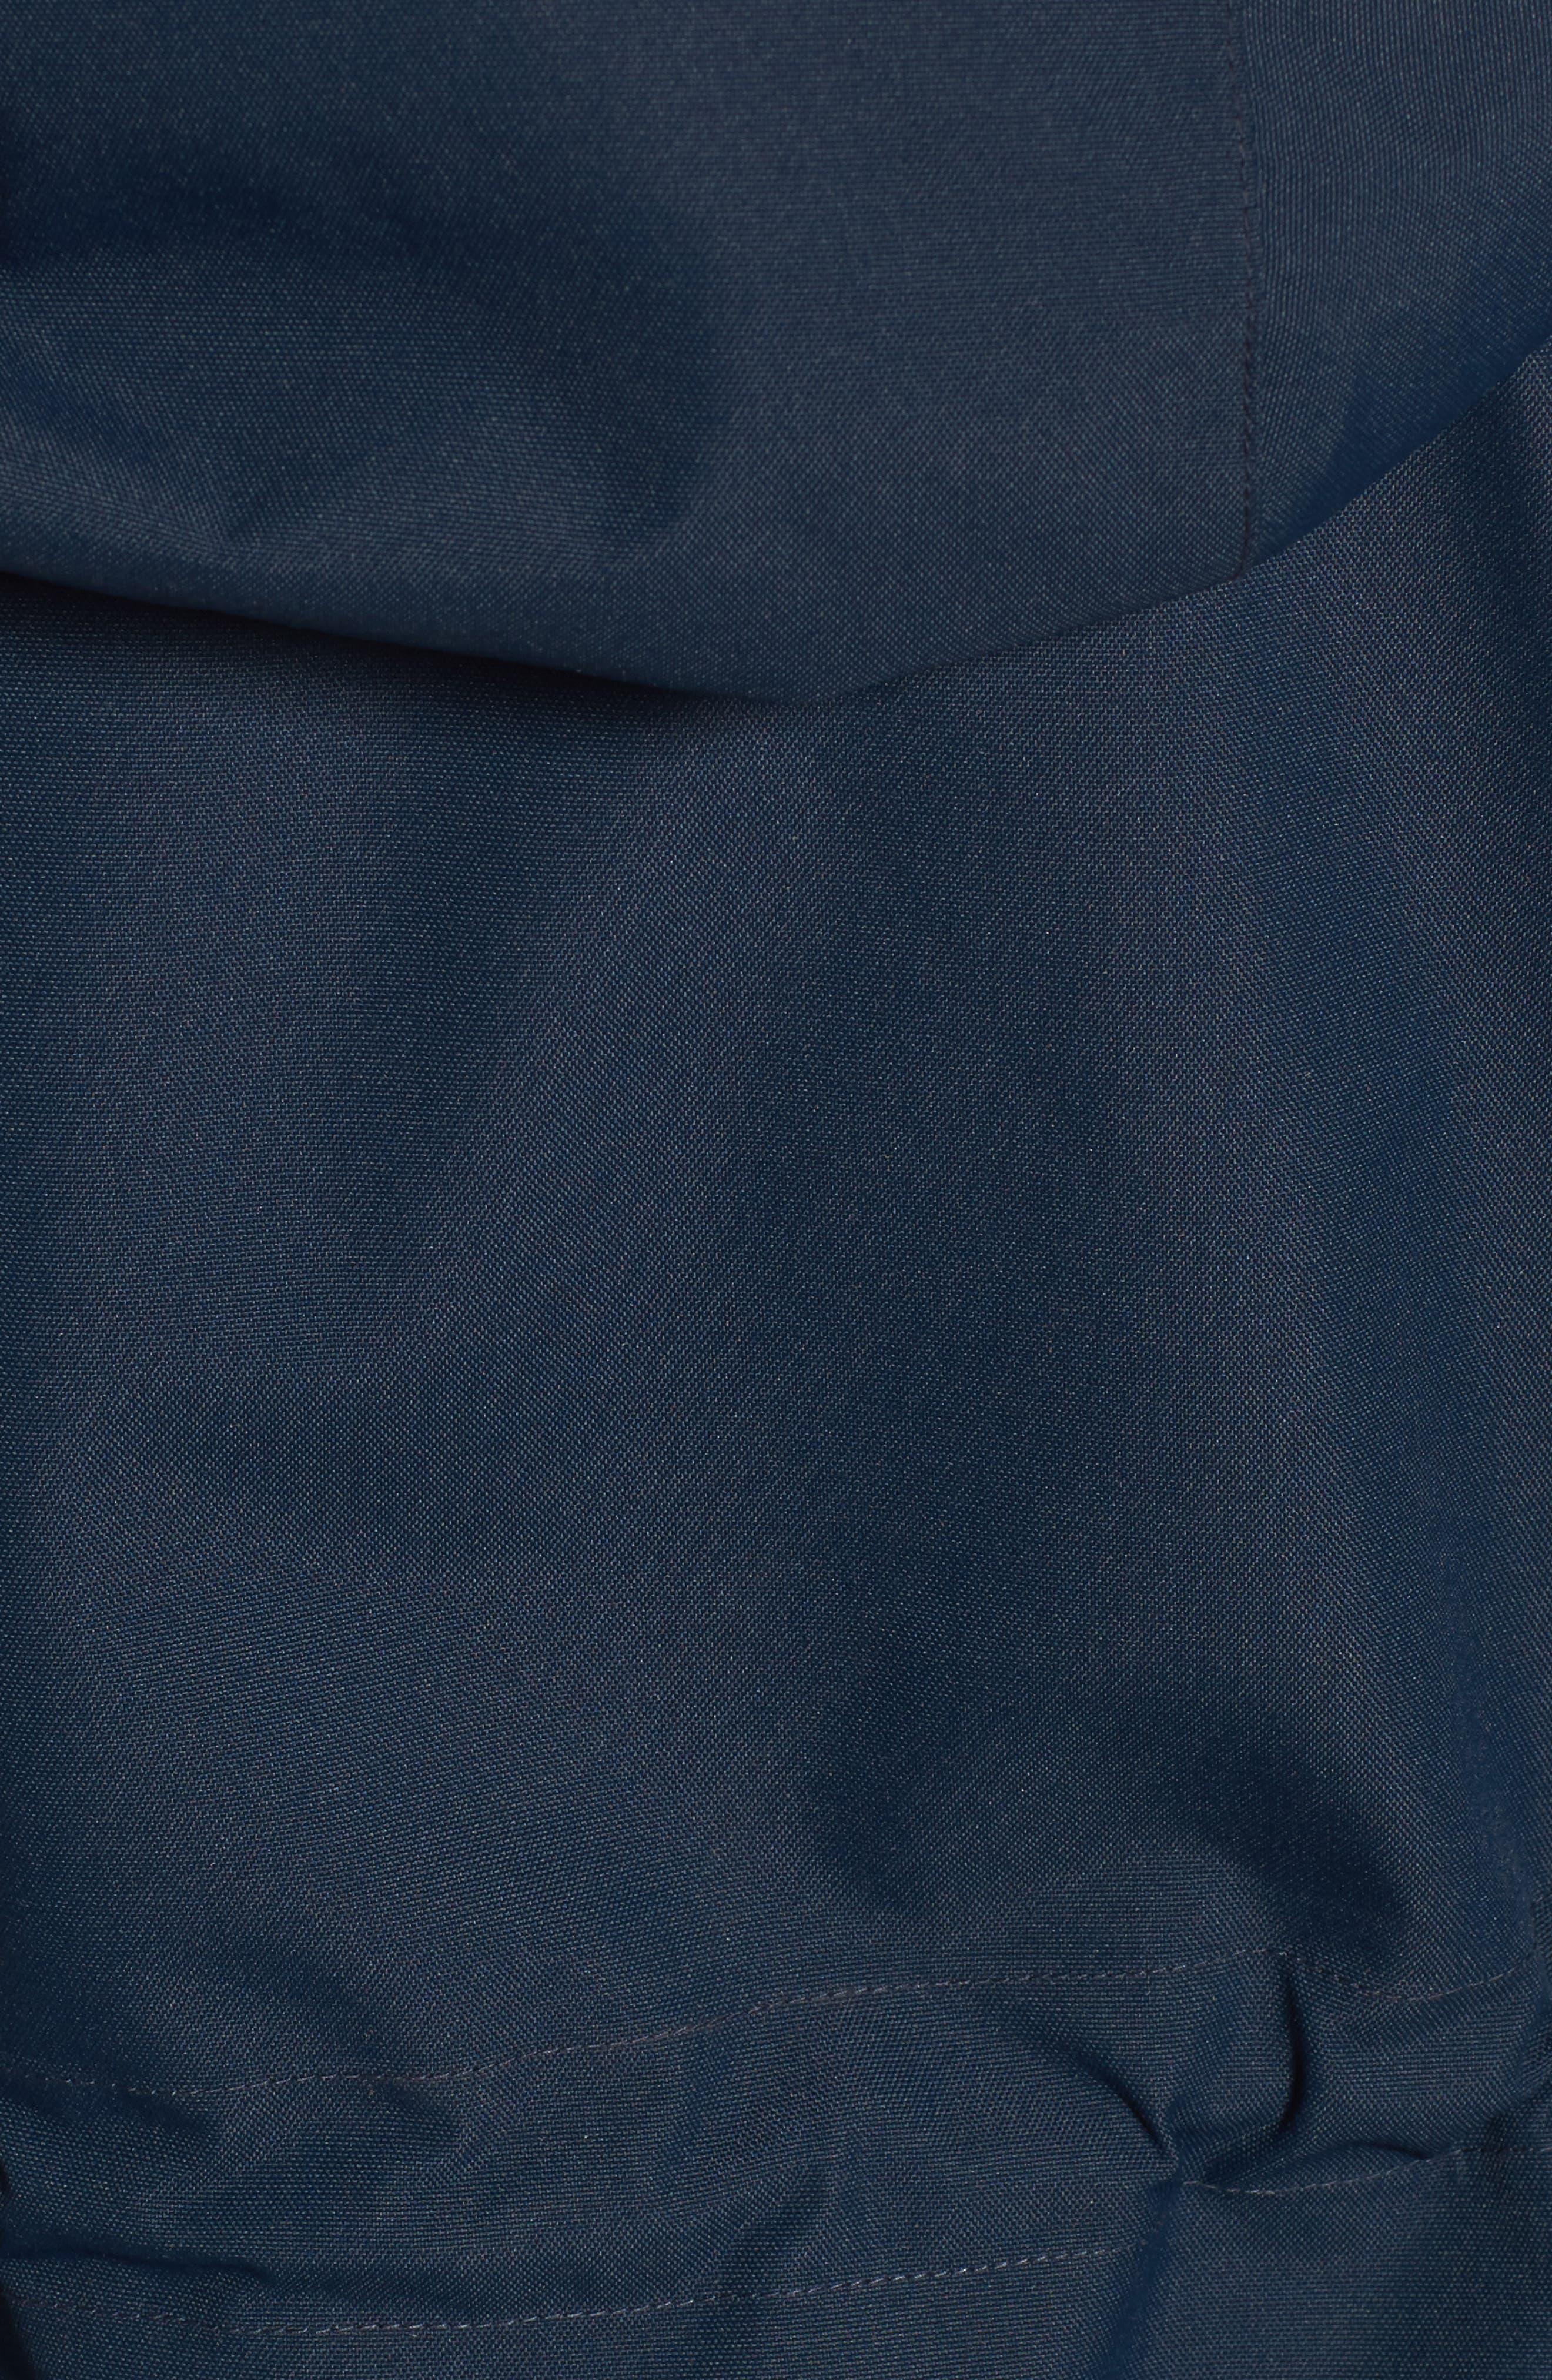 Sleet Hooded Jacket,                             Alternate thumbnail 12, color,